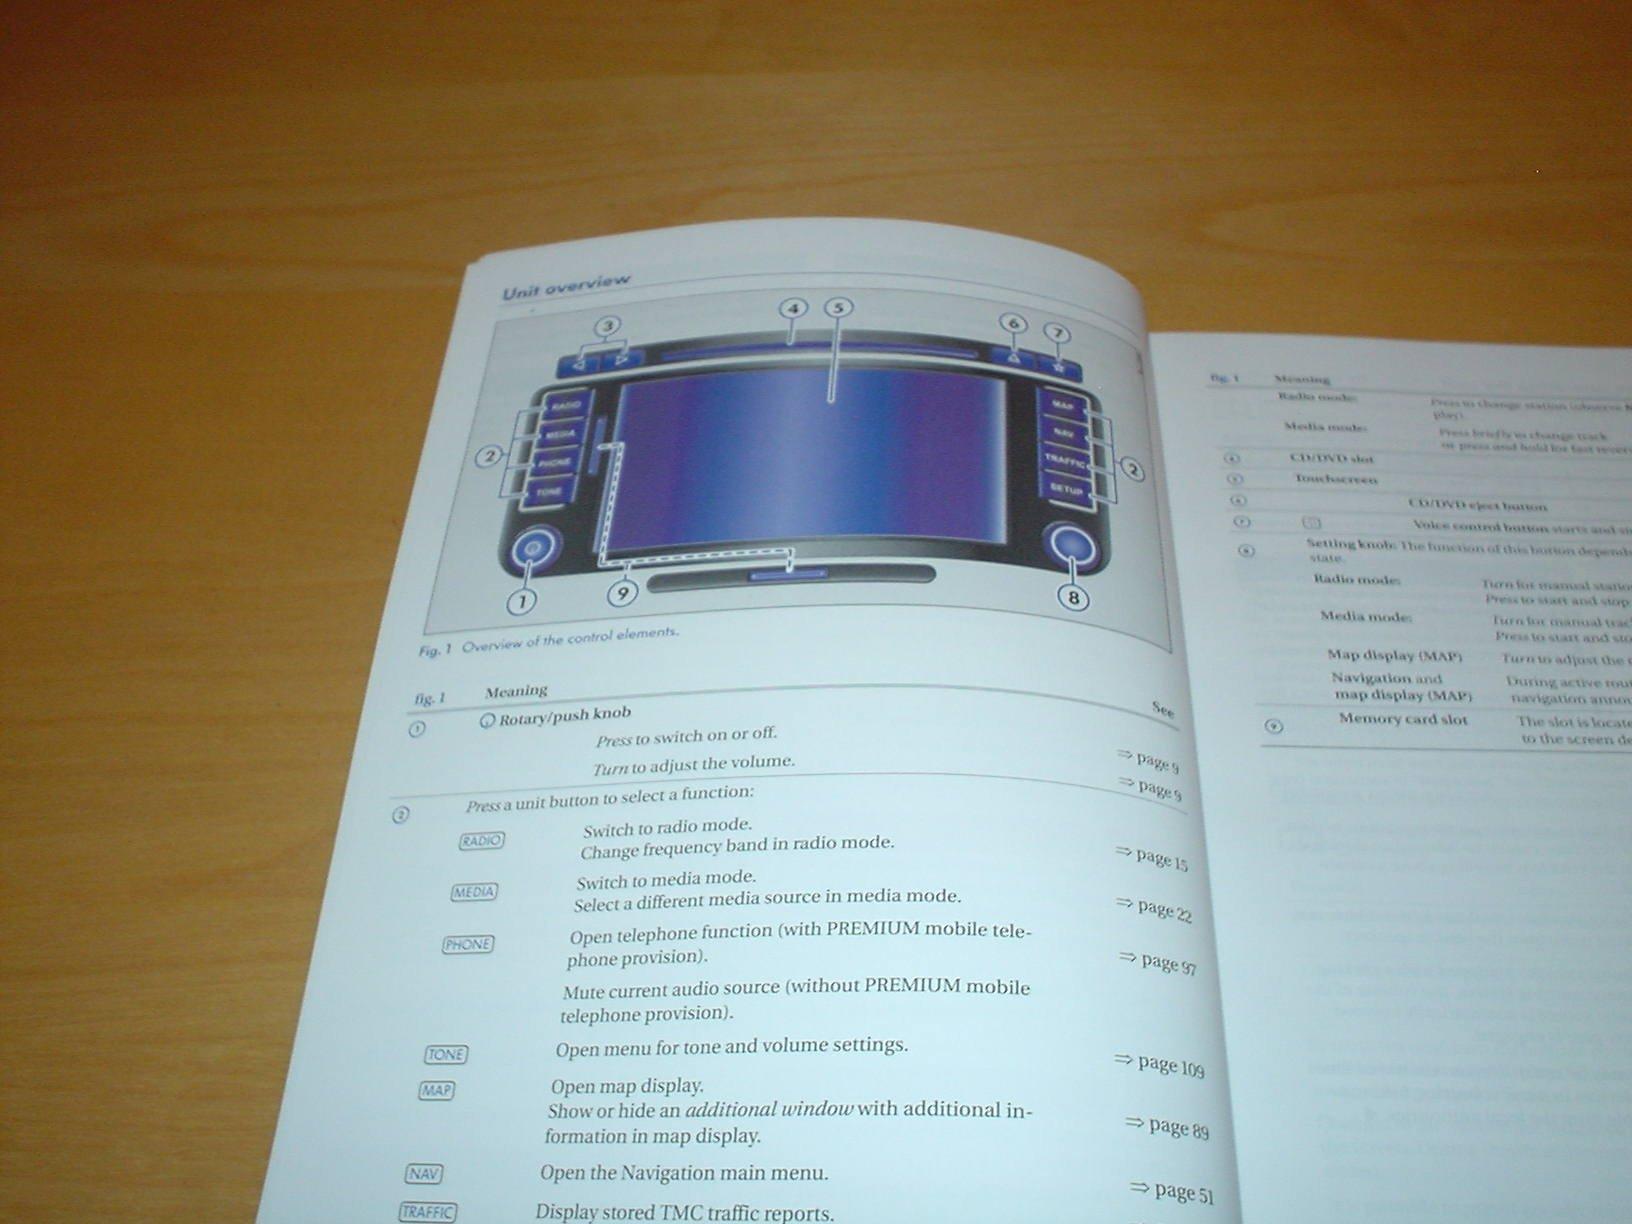 Volkswagen rns 510 navigation system owners manual handbook rns510.